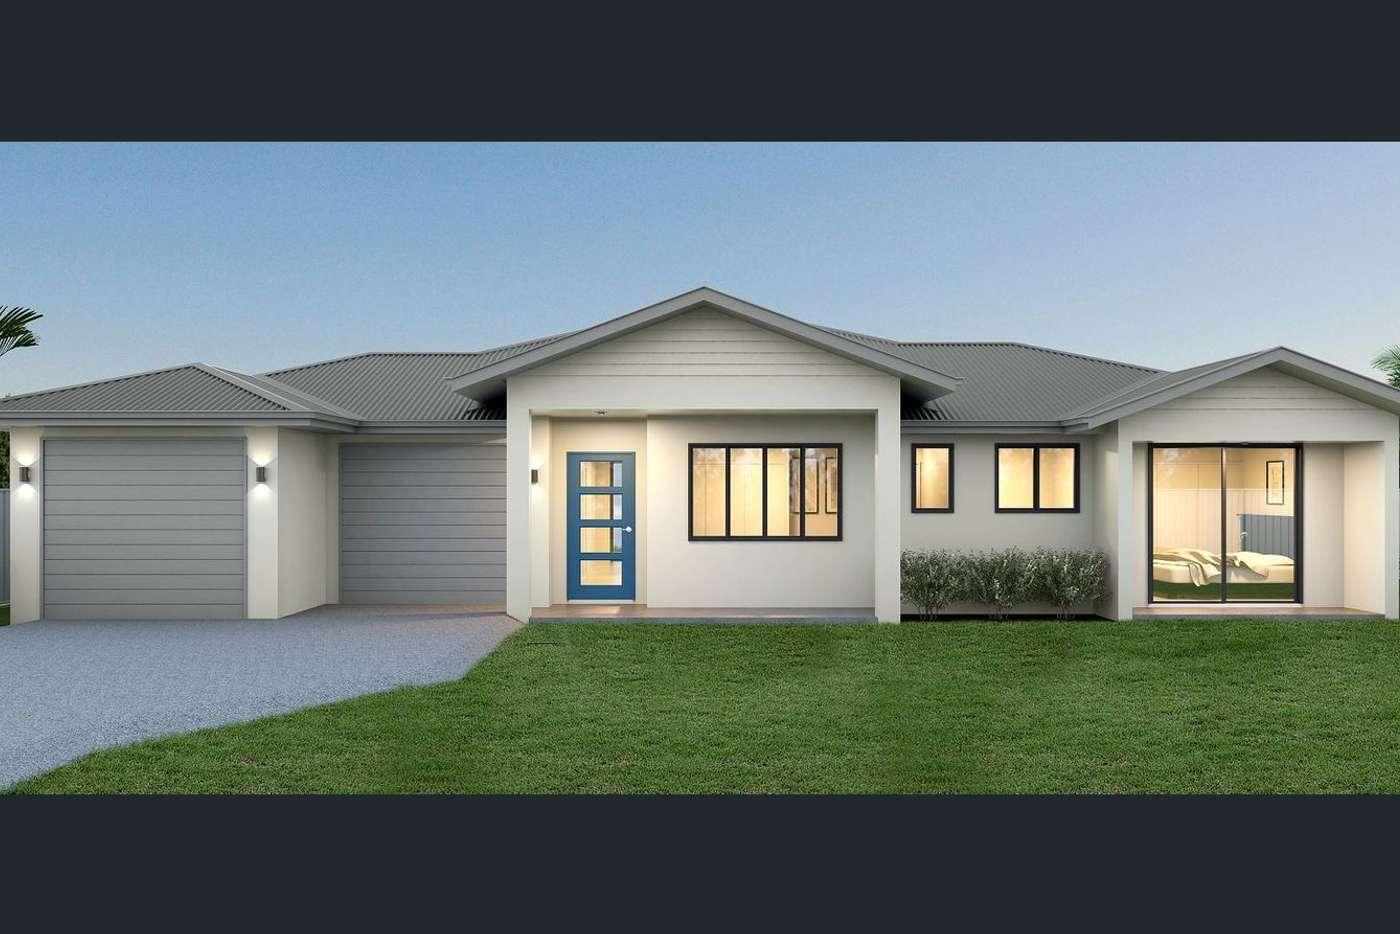 Main view of Homely house listing, 23 Acacia Avenue, Yungaburra QLD 4884